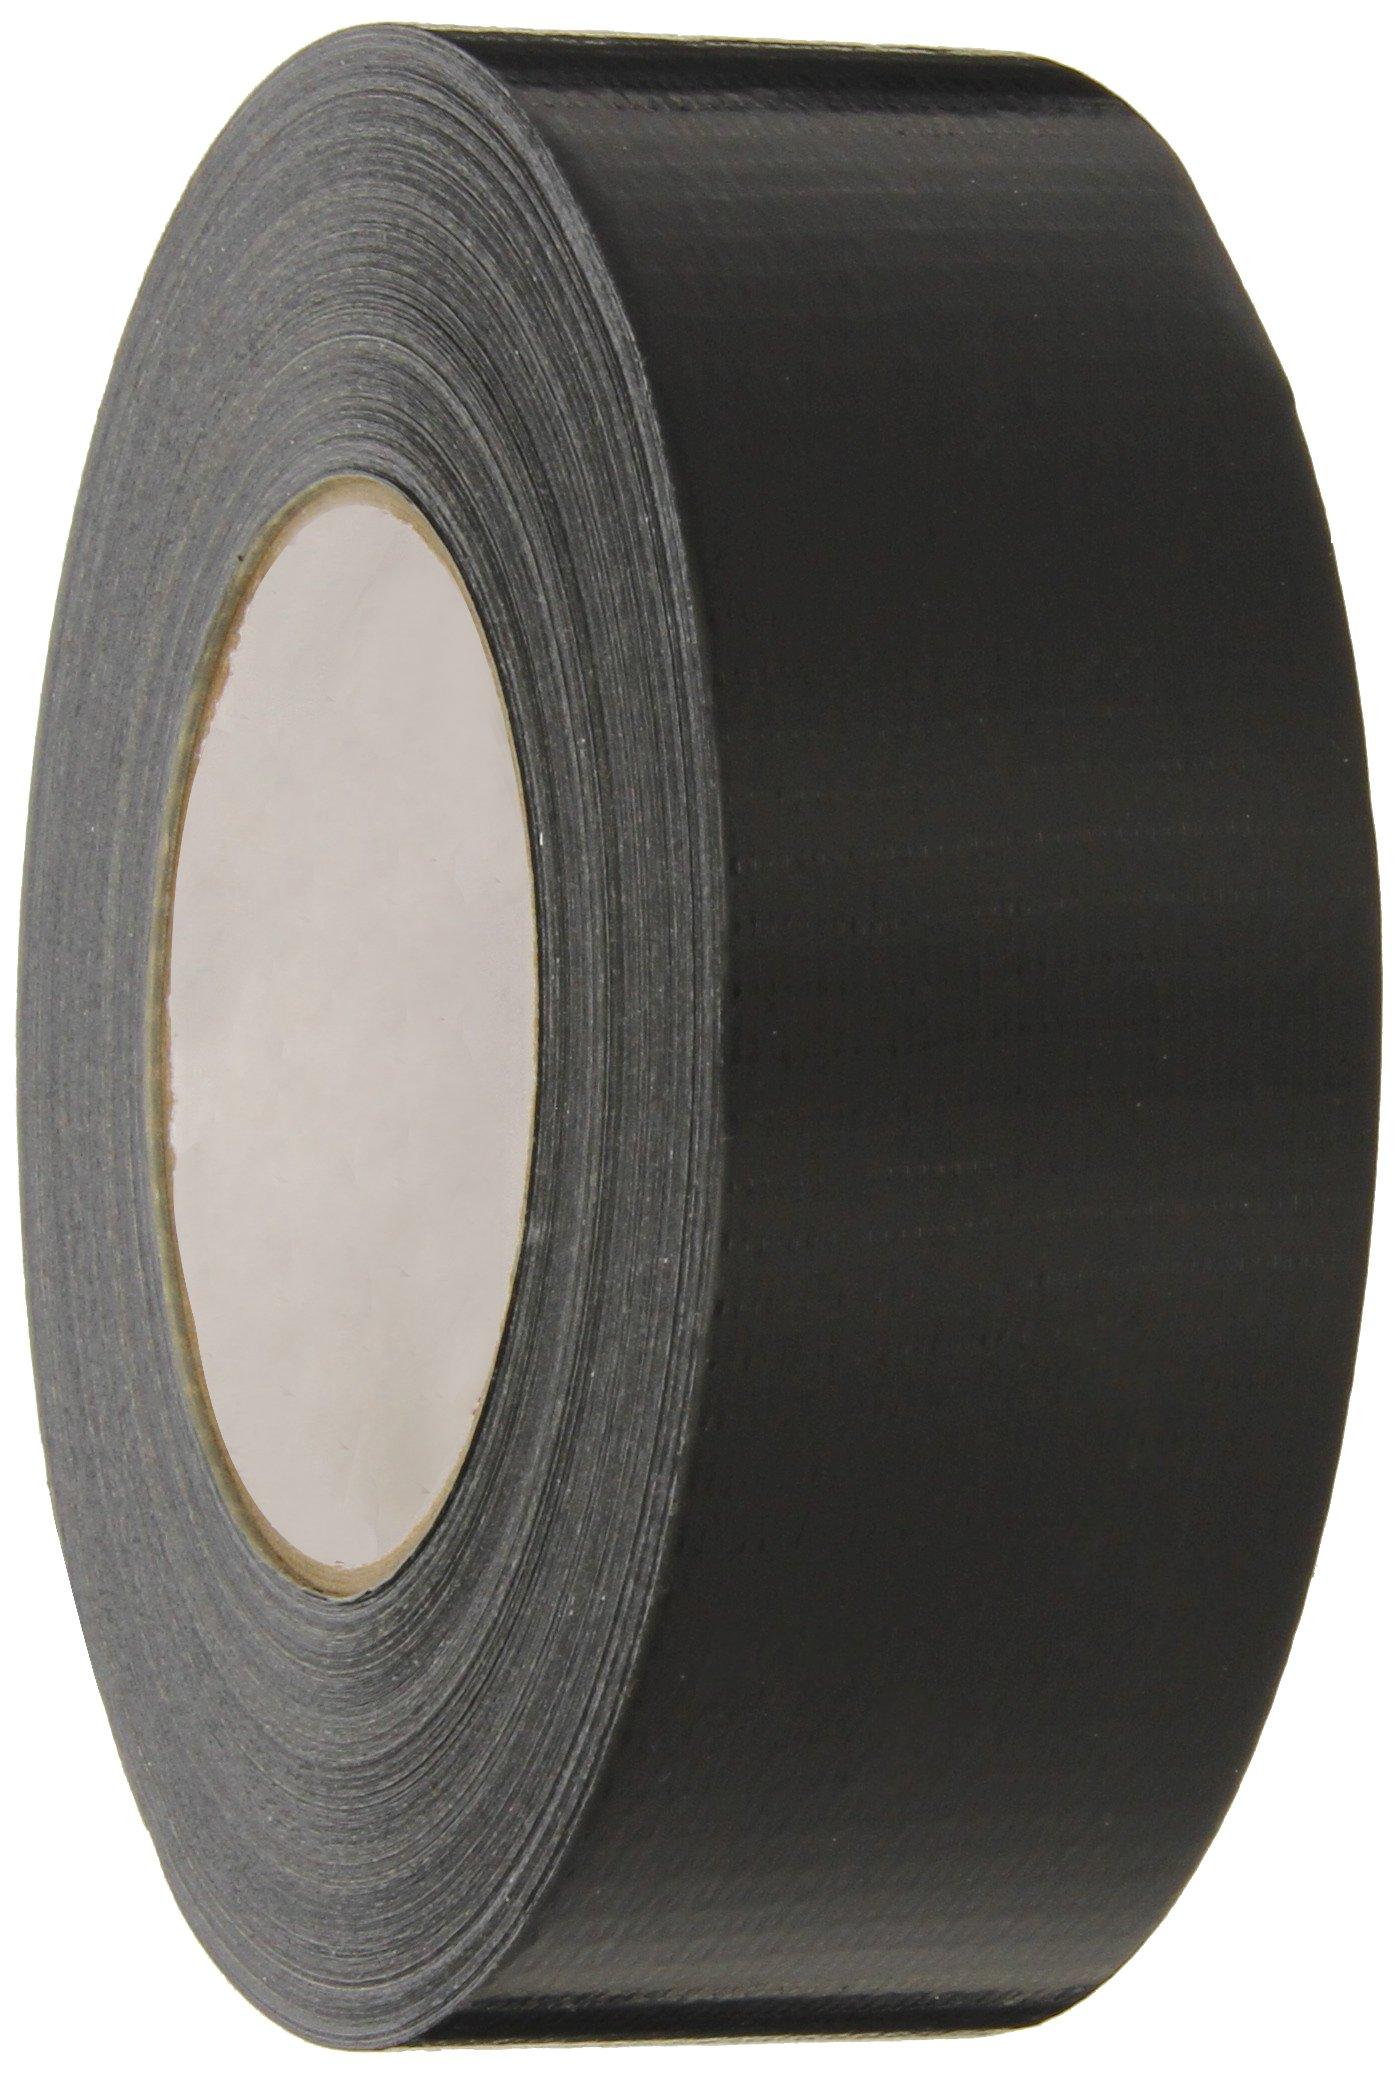 Nashua 2280 Polyethylene Coated Cloth Multi-Purpose Duct Tape, 55m Length x 72mm Width, Black